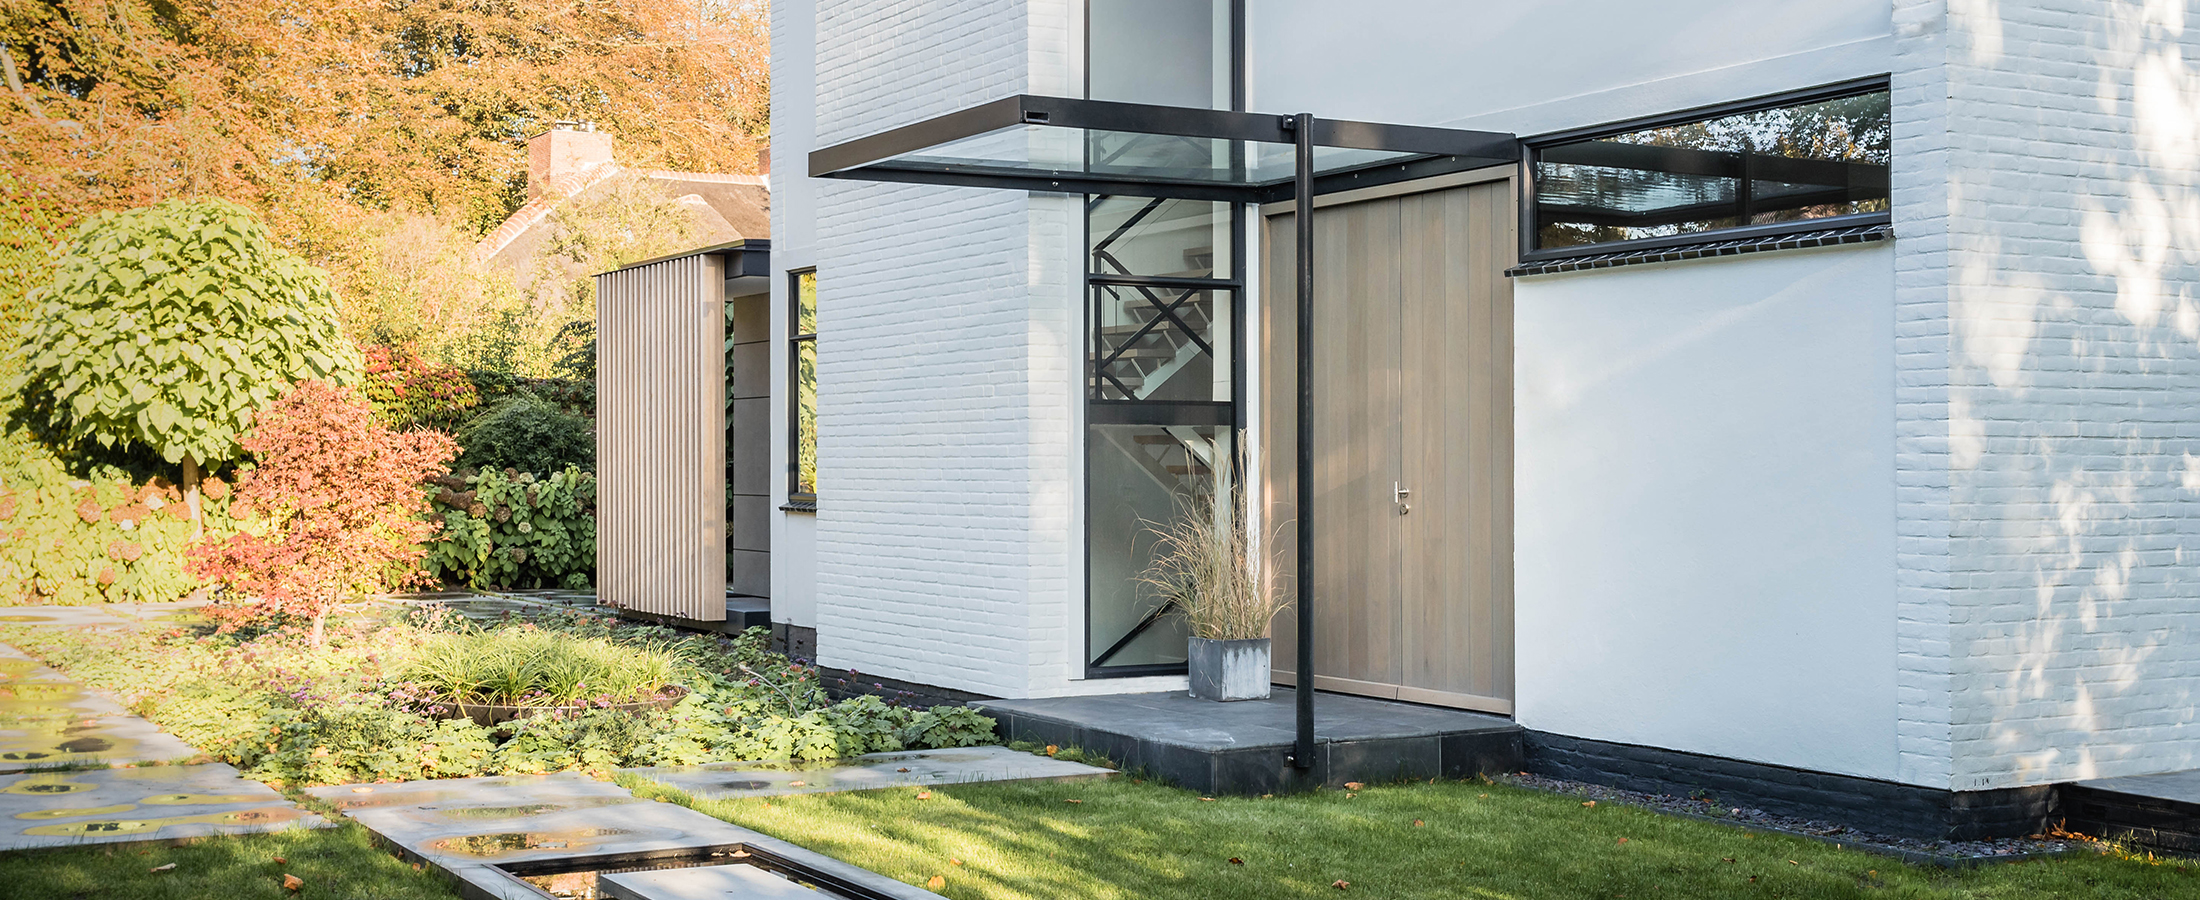 Villa Bloemcamplaan, Wassenaar